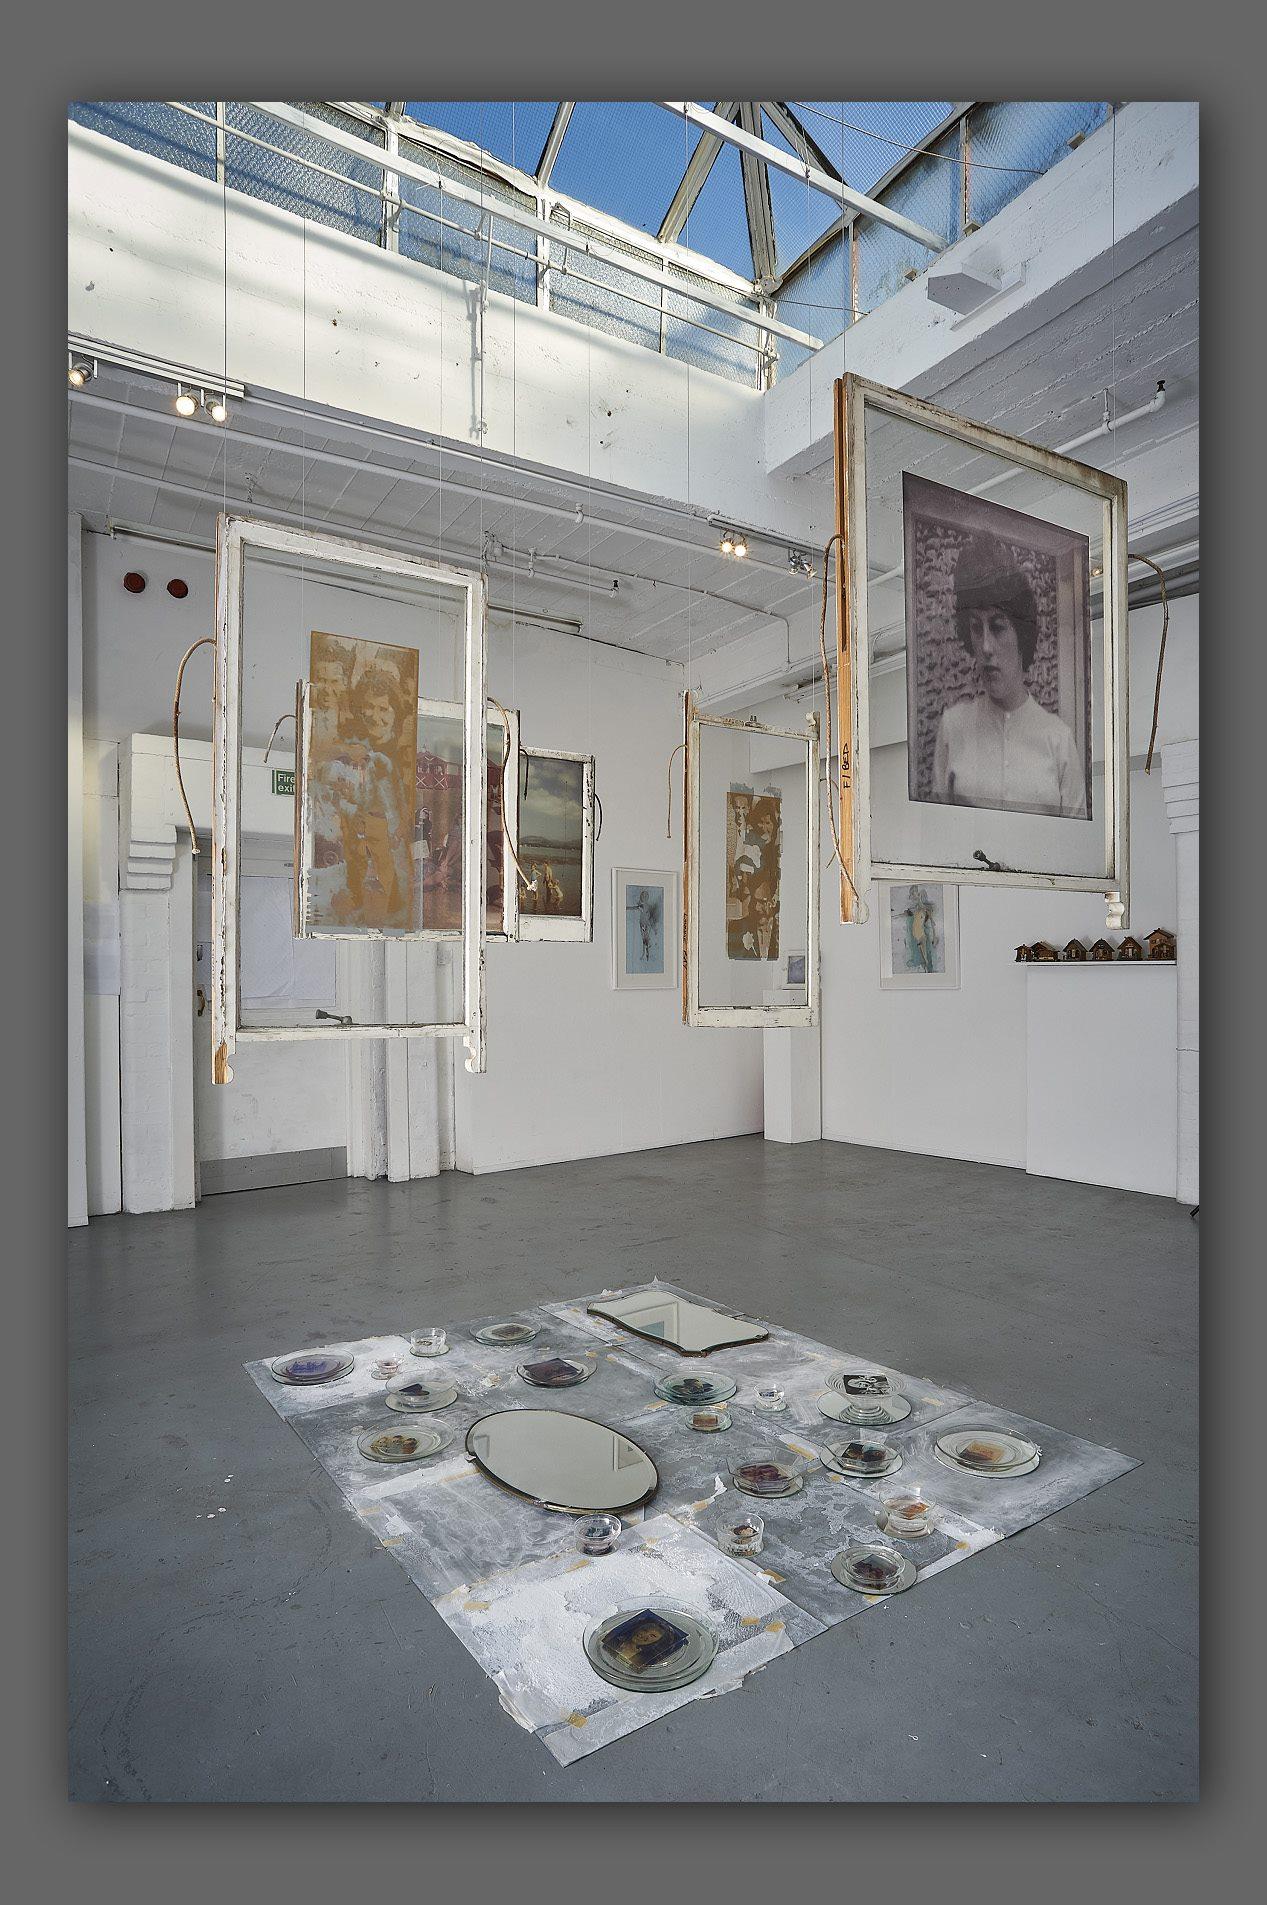 Joan Molloy exhibition, Deptford X - 2018 festival